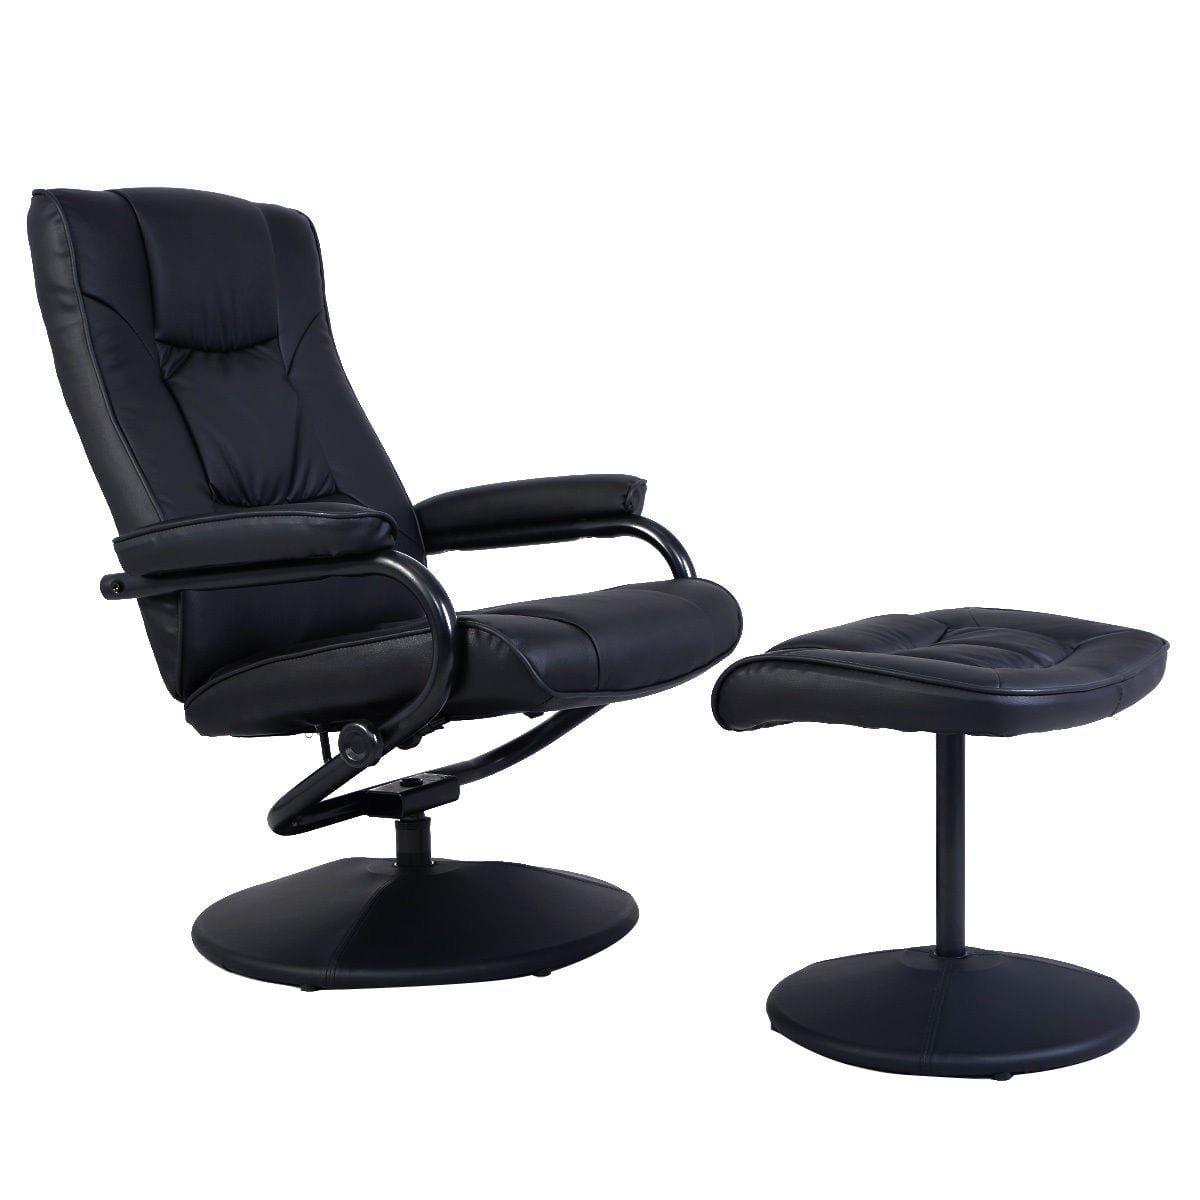 Costway Recliner Chair Swivel Armchair Lounge Seat w